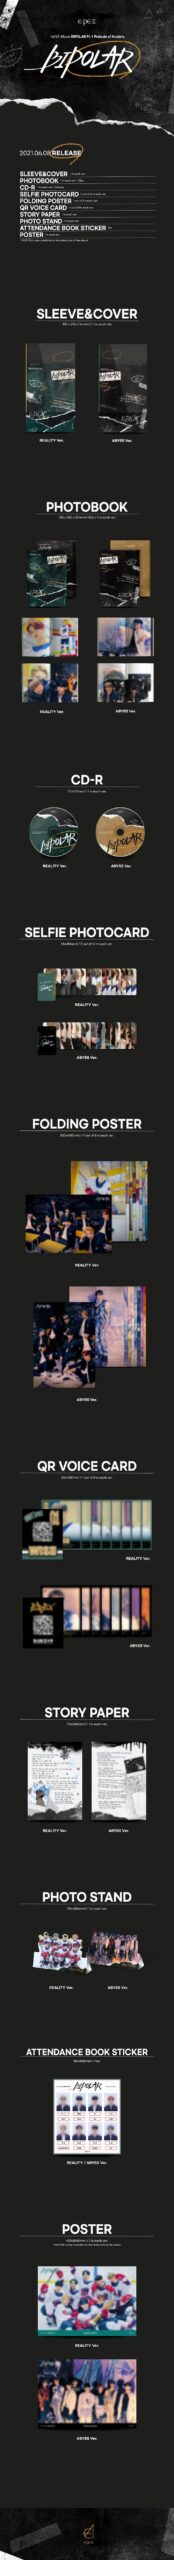 1st EP de EPEX Bipolar Pt.1 불안의 서 ABYSS Ver. o REALITY Ver. Poster 1